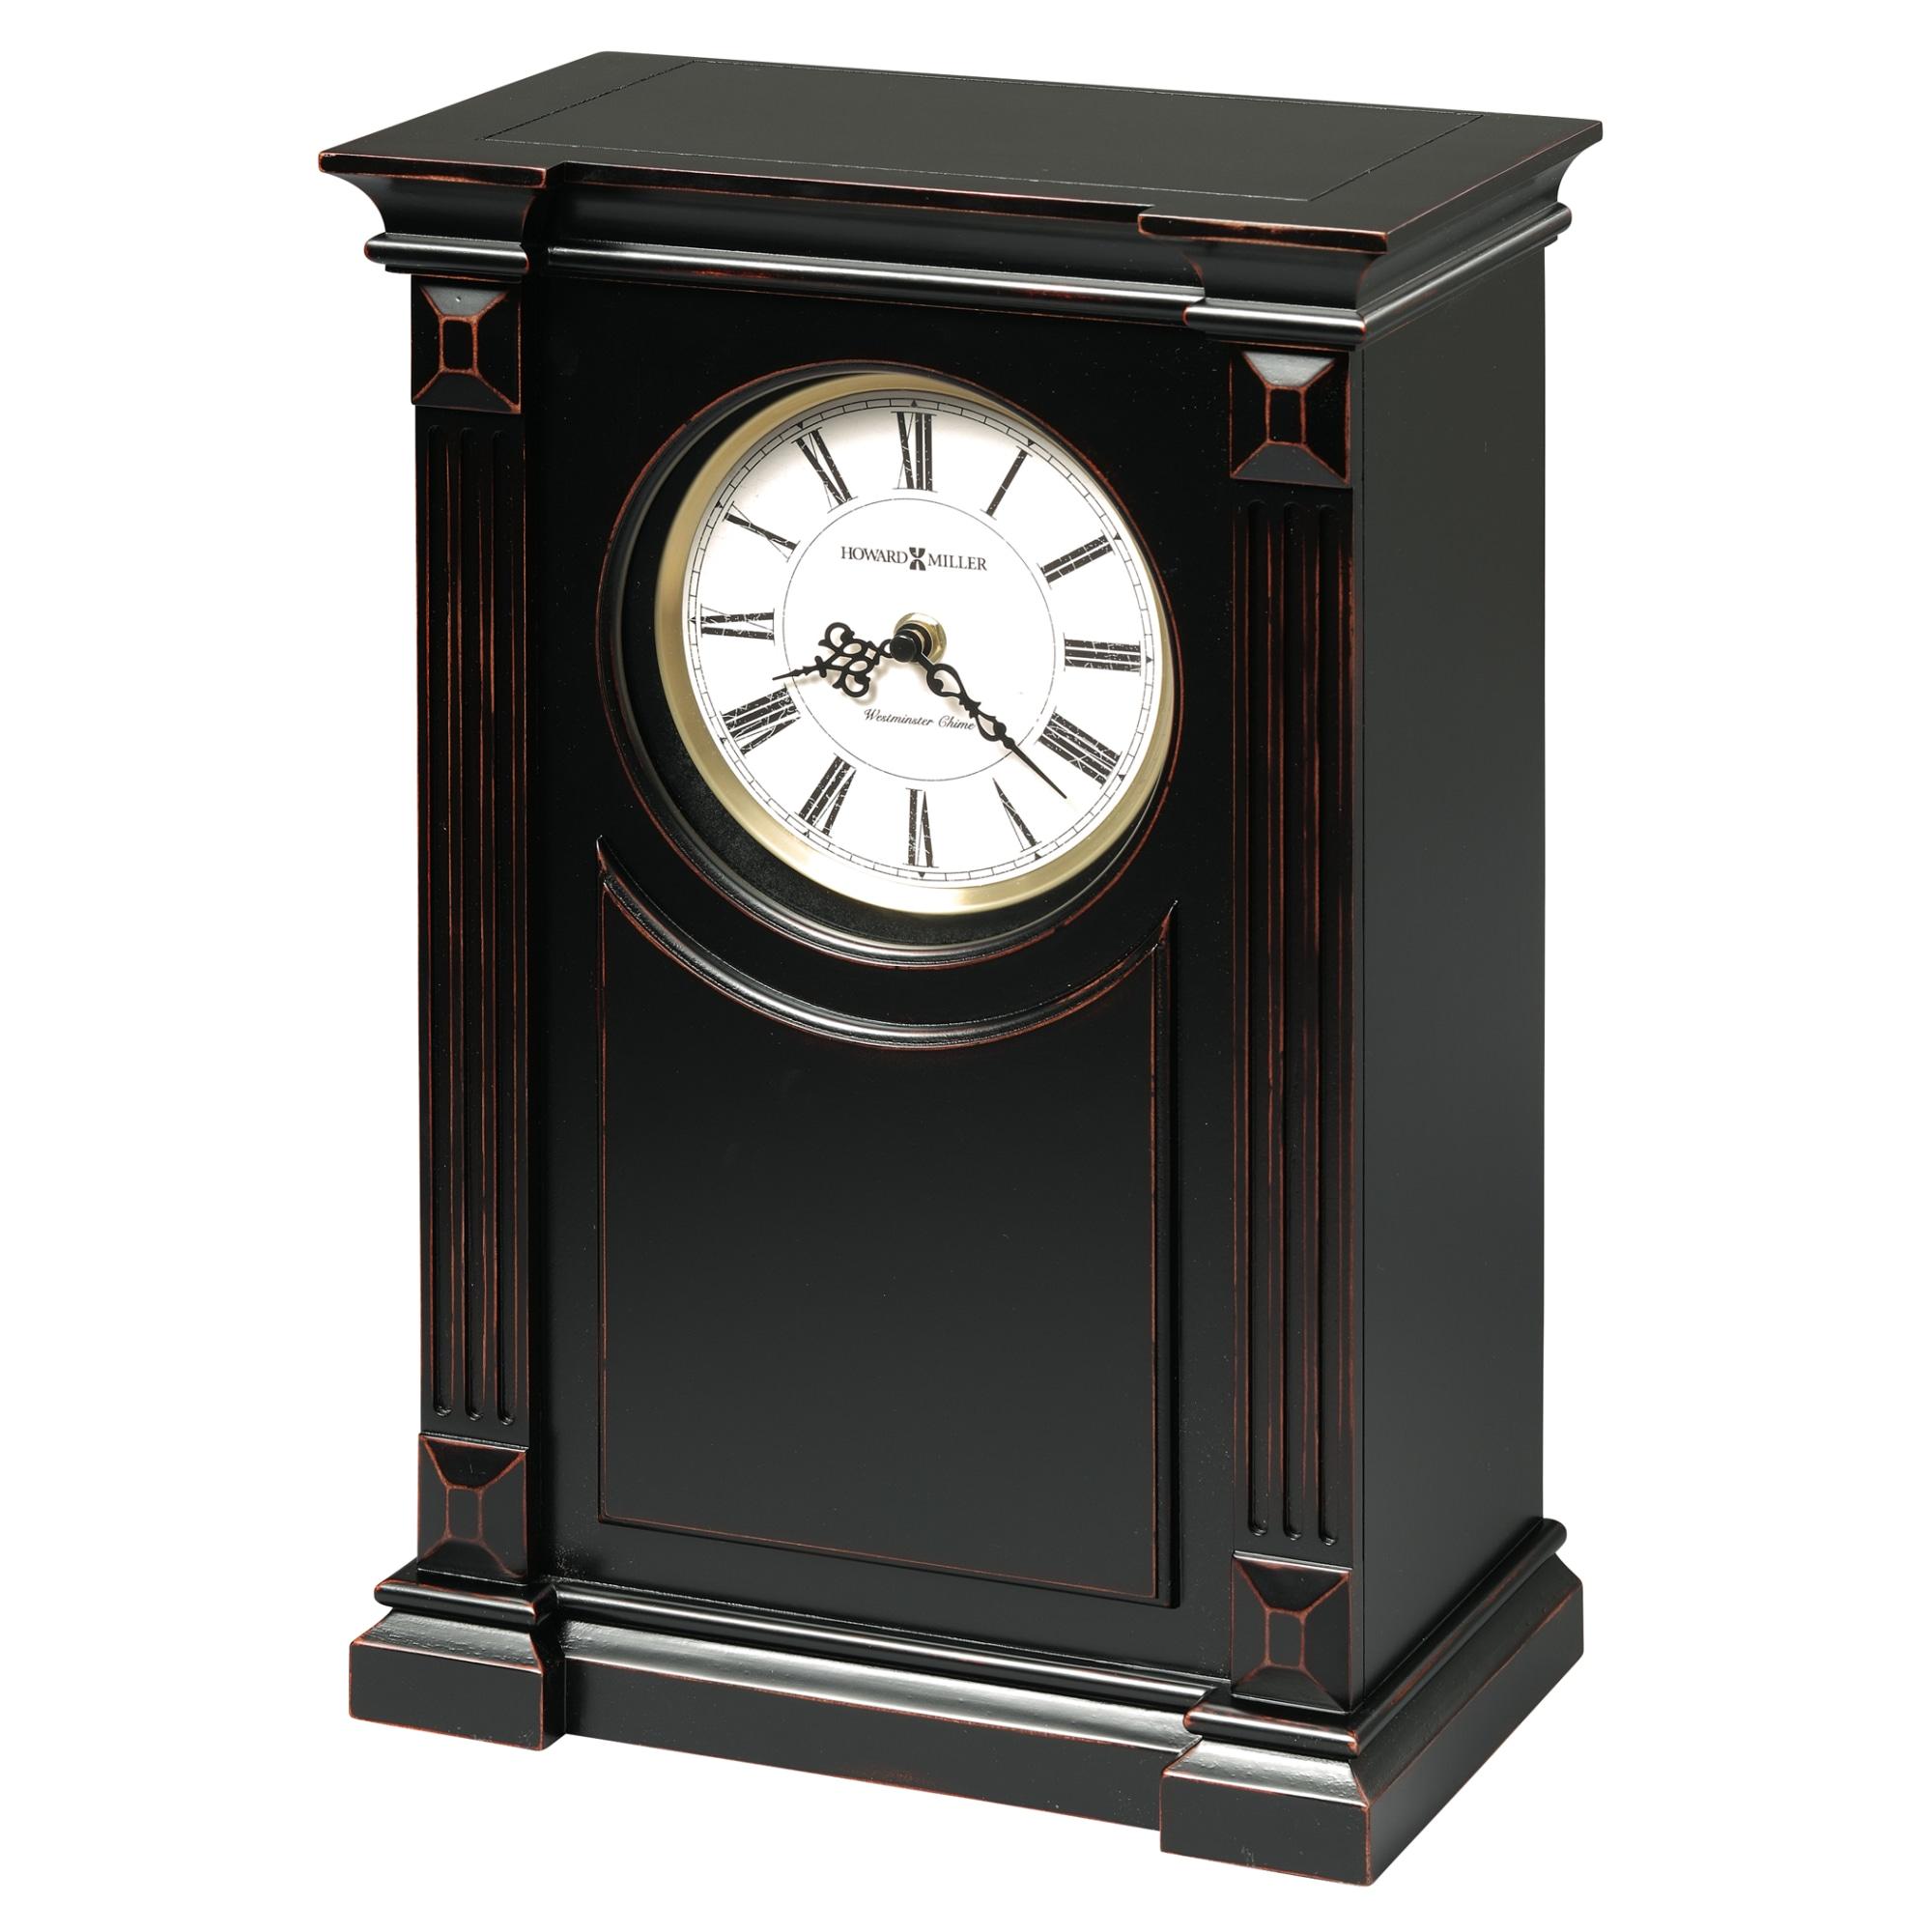 Image for 800-199 Statesman Mantel Clock Urn from Howard Miller Official Website